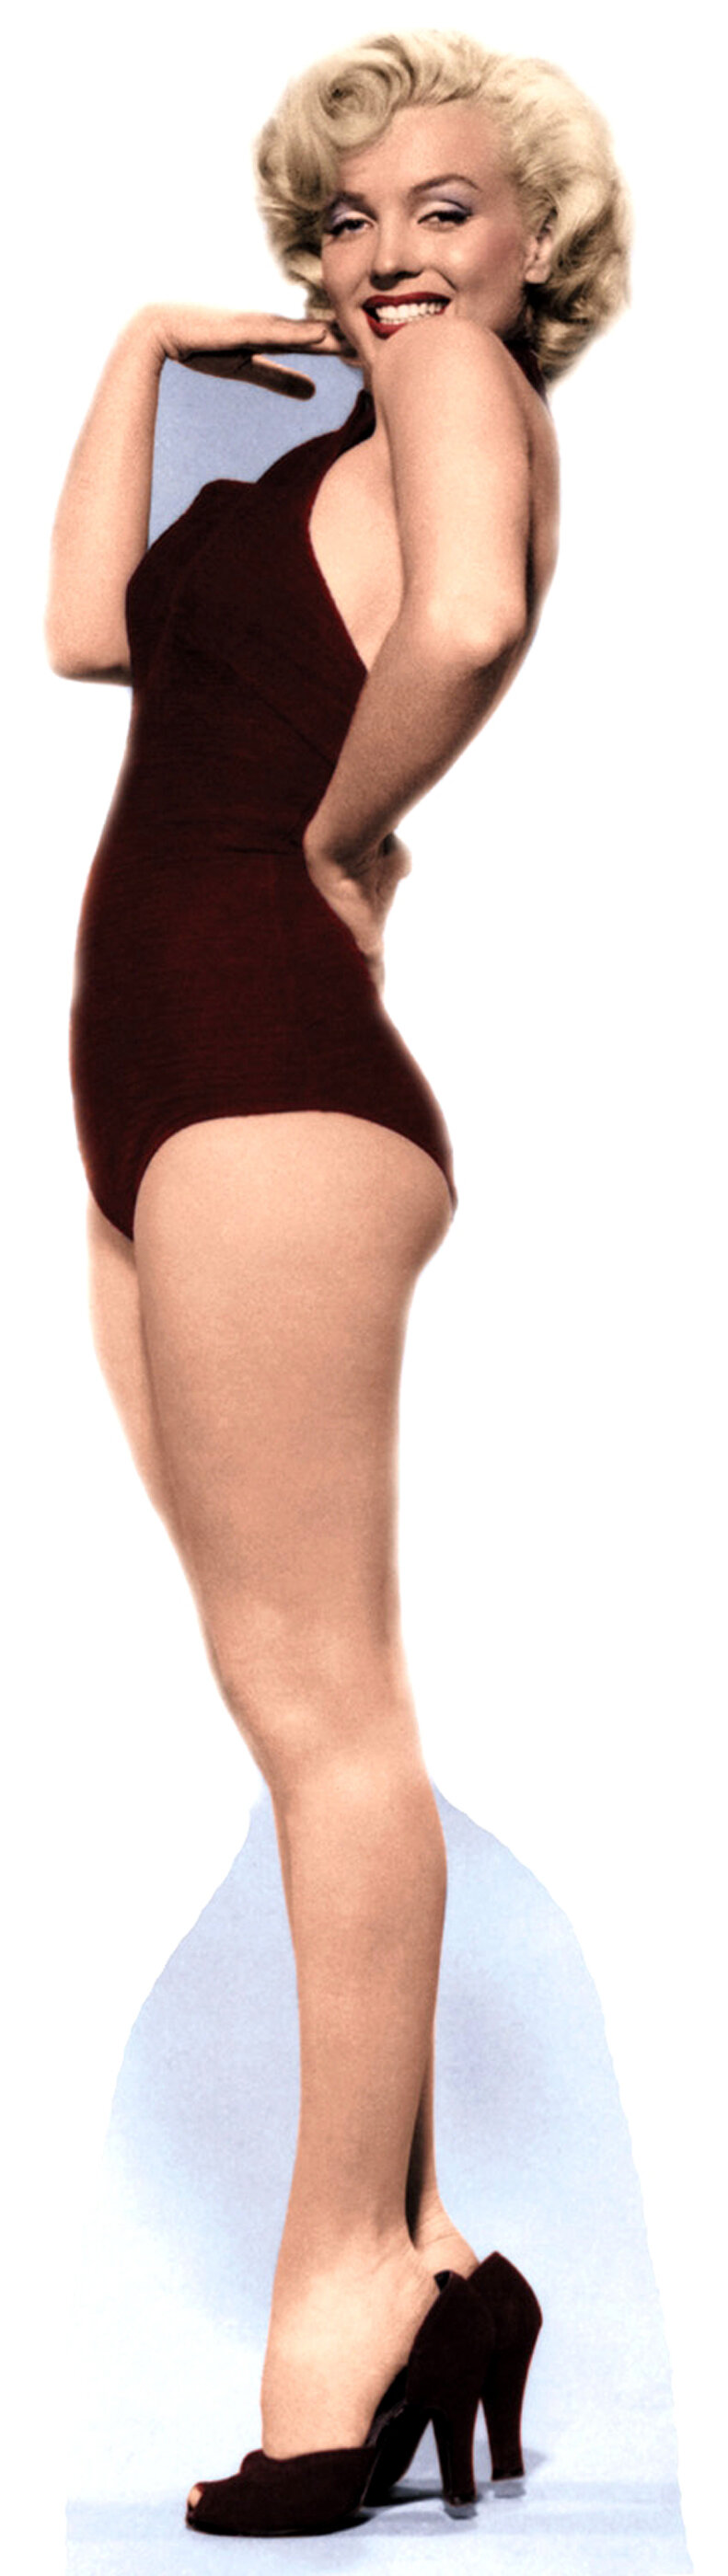 2c0c0d31f2b48 Advanced Graphics Cardboard Hollywood Marilyn Monroe - Swimsuit Standup